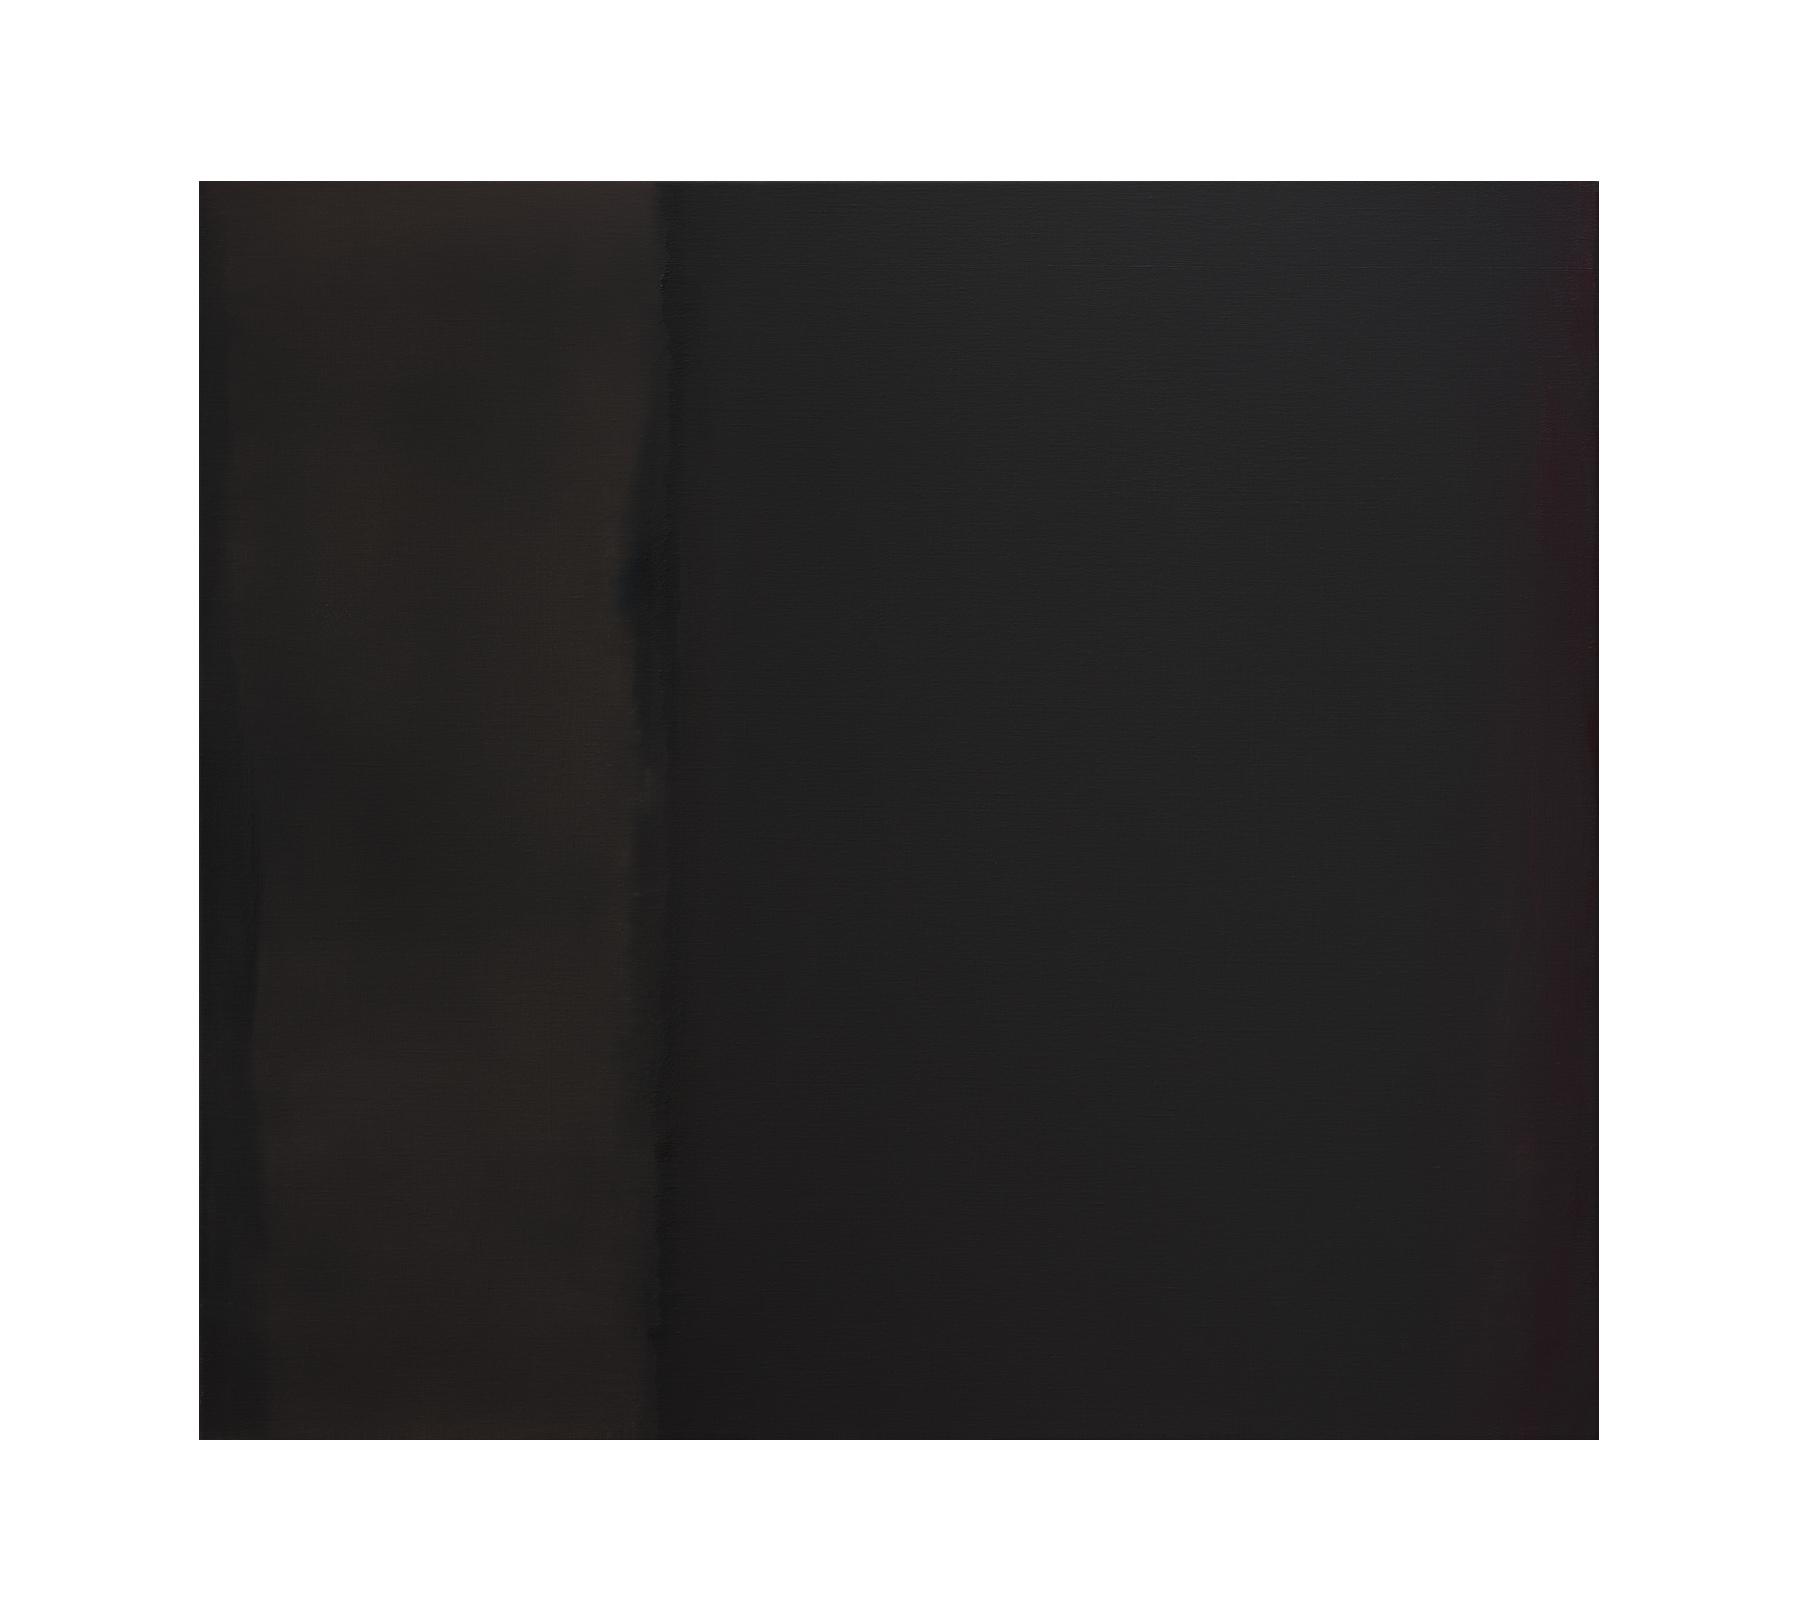 Untitled 2018 90x100cm